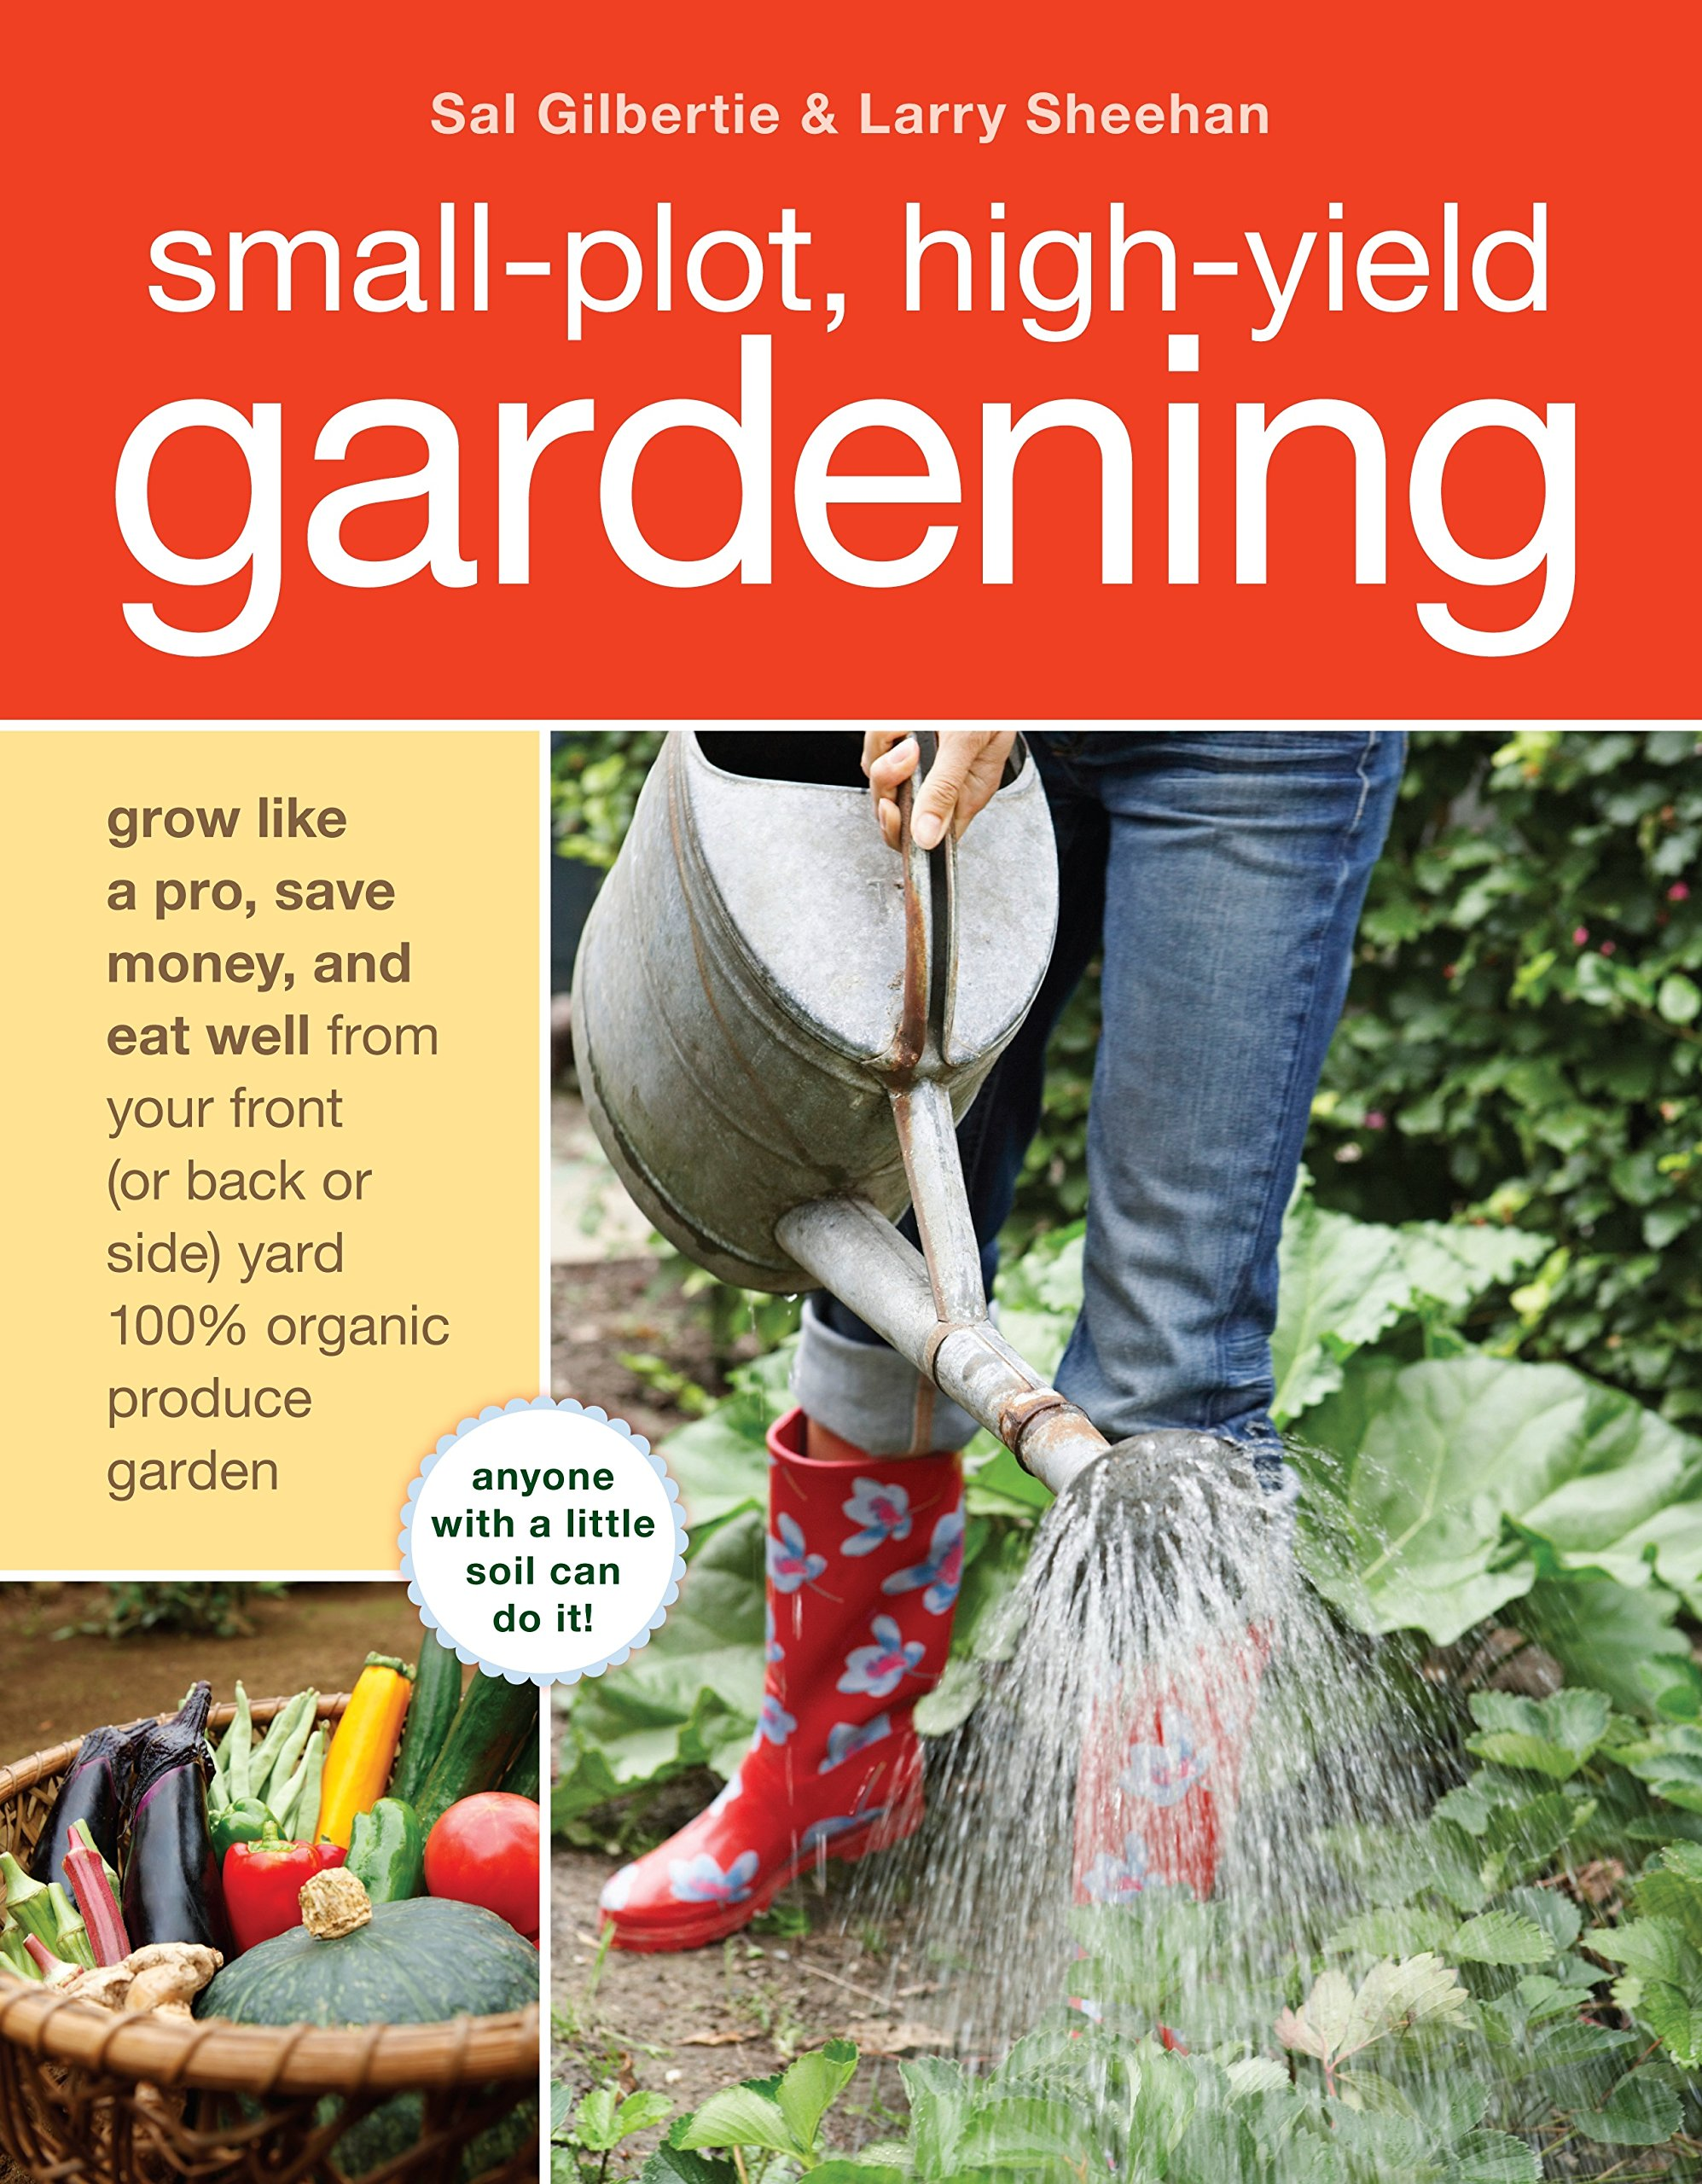 small plot high yield gardening.jpg